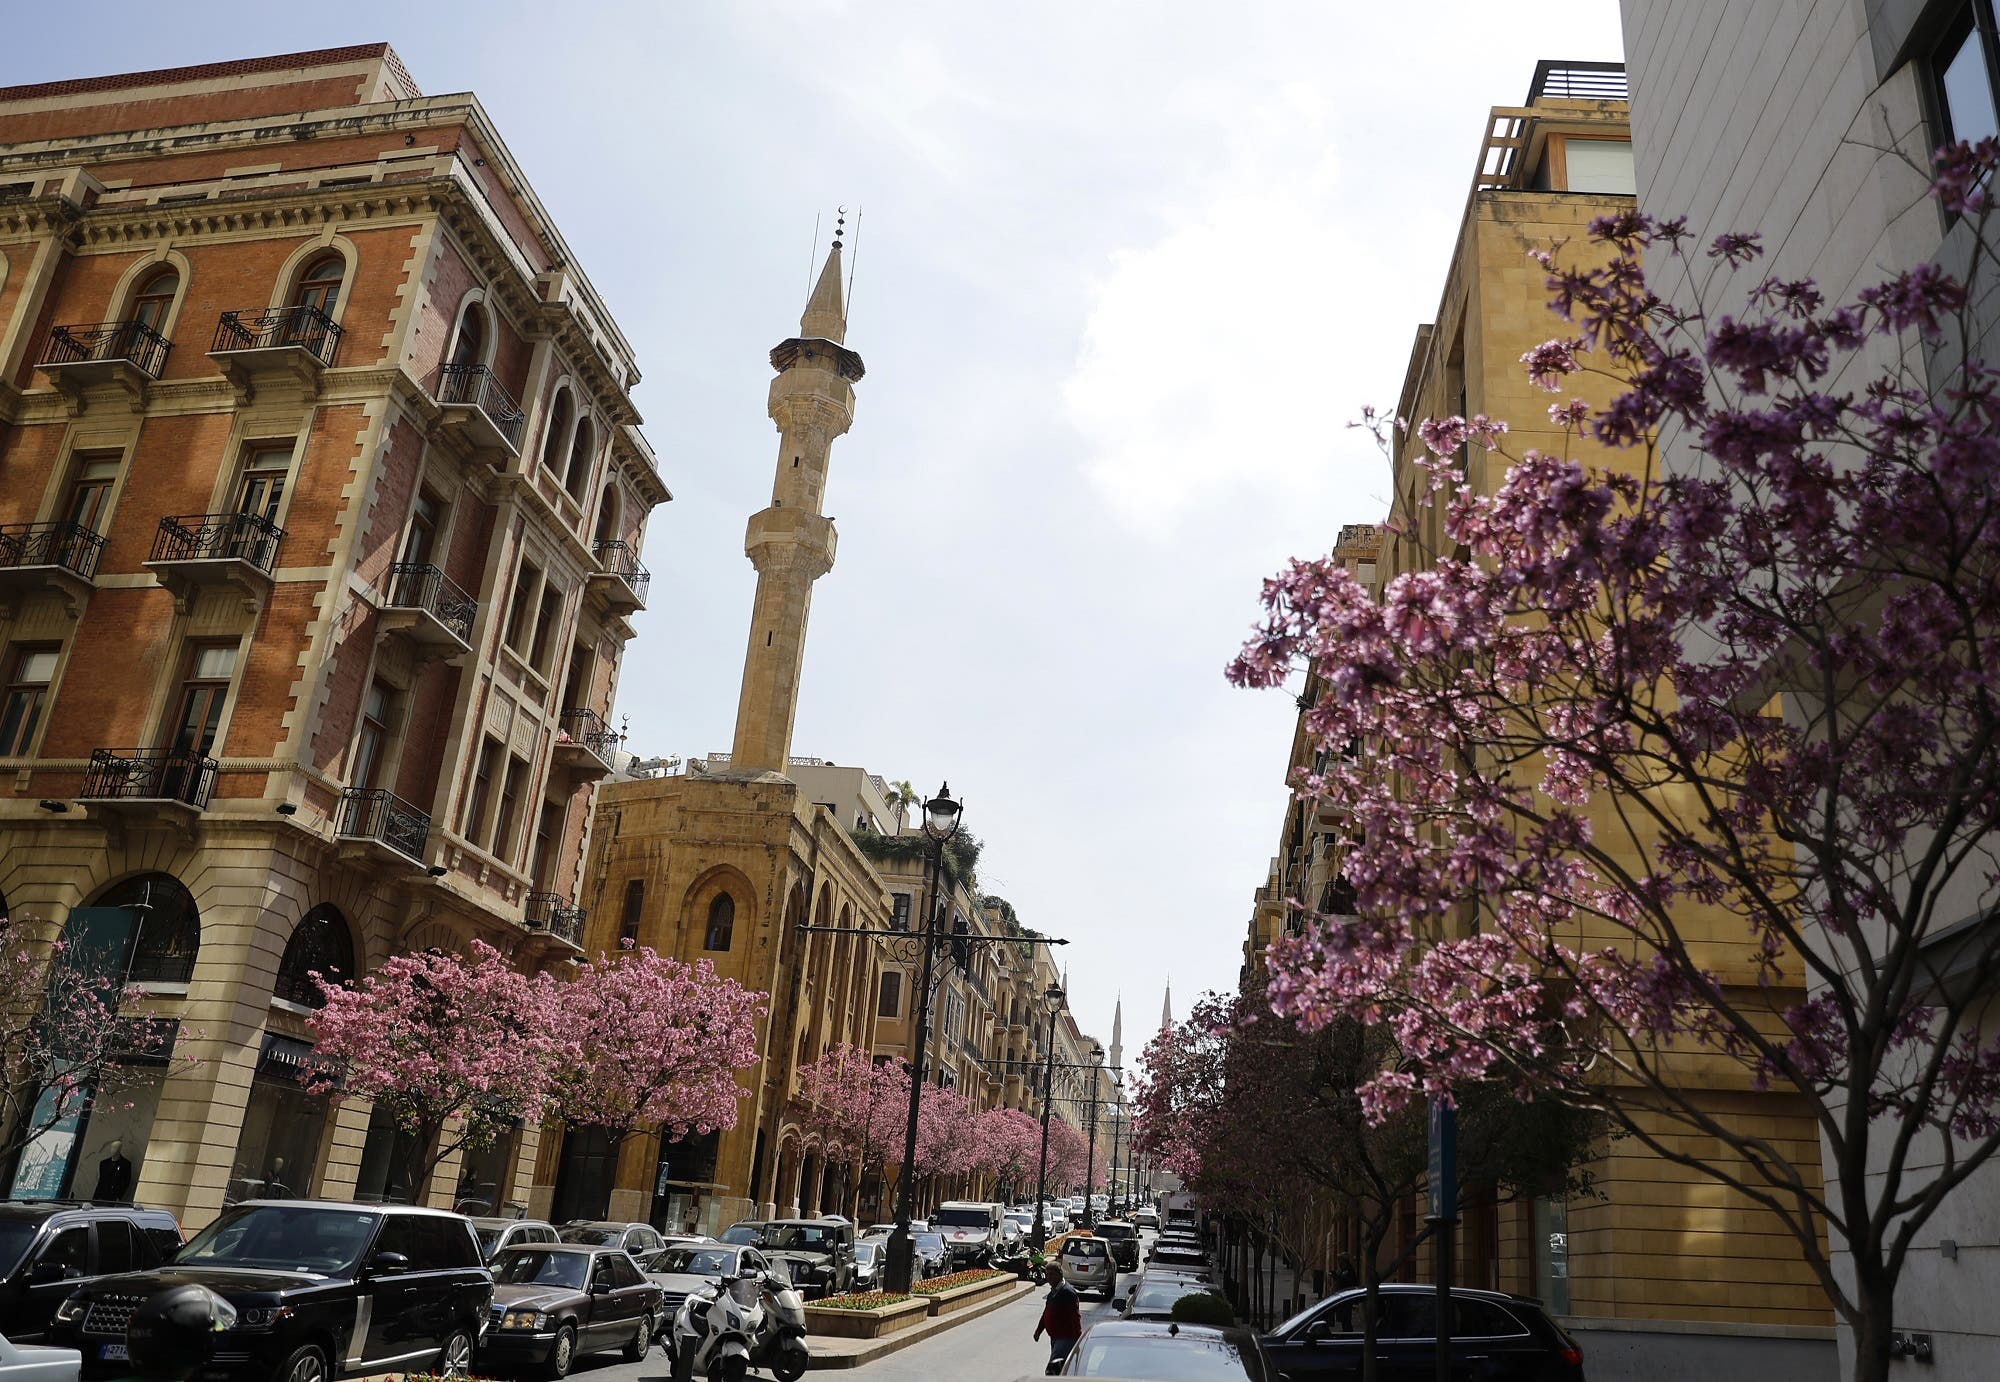 Downtown Beirut, Lebanon - AFP